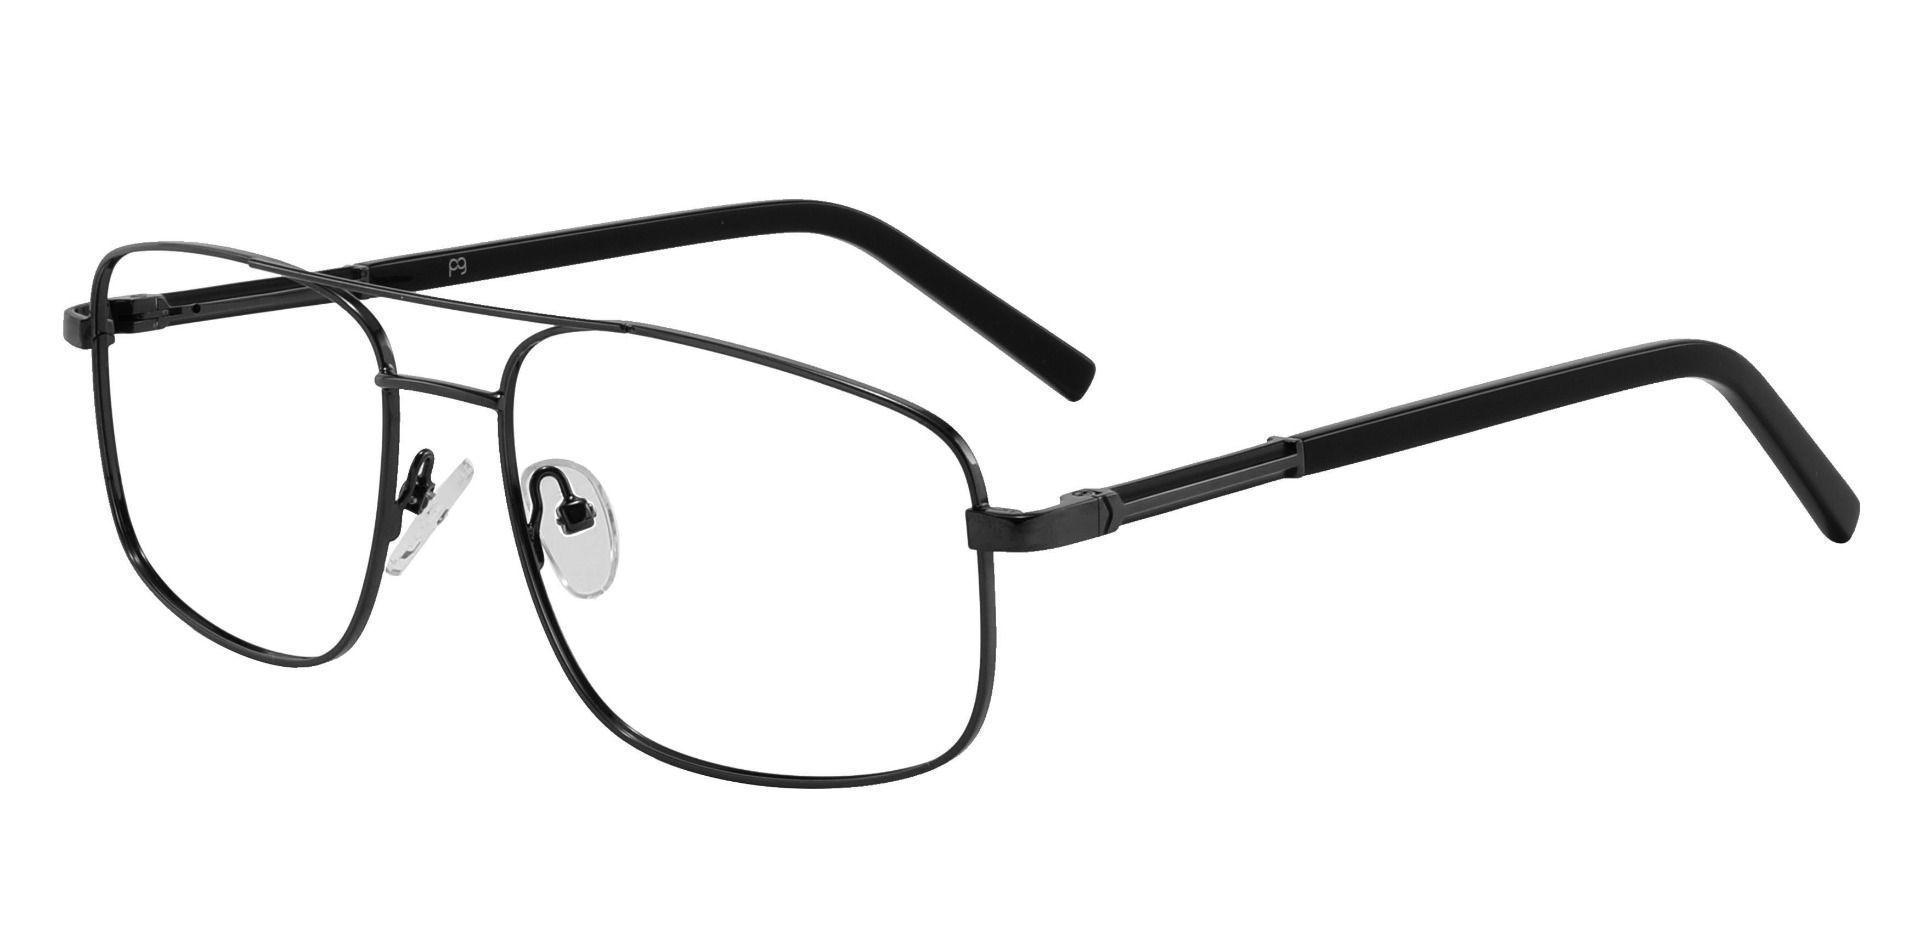 Davenport Aviator Prescription Glasses - Black